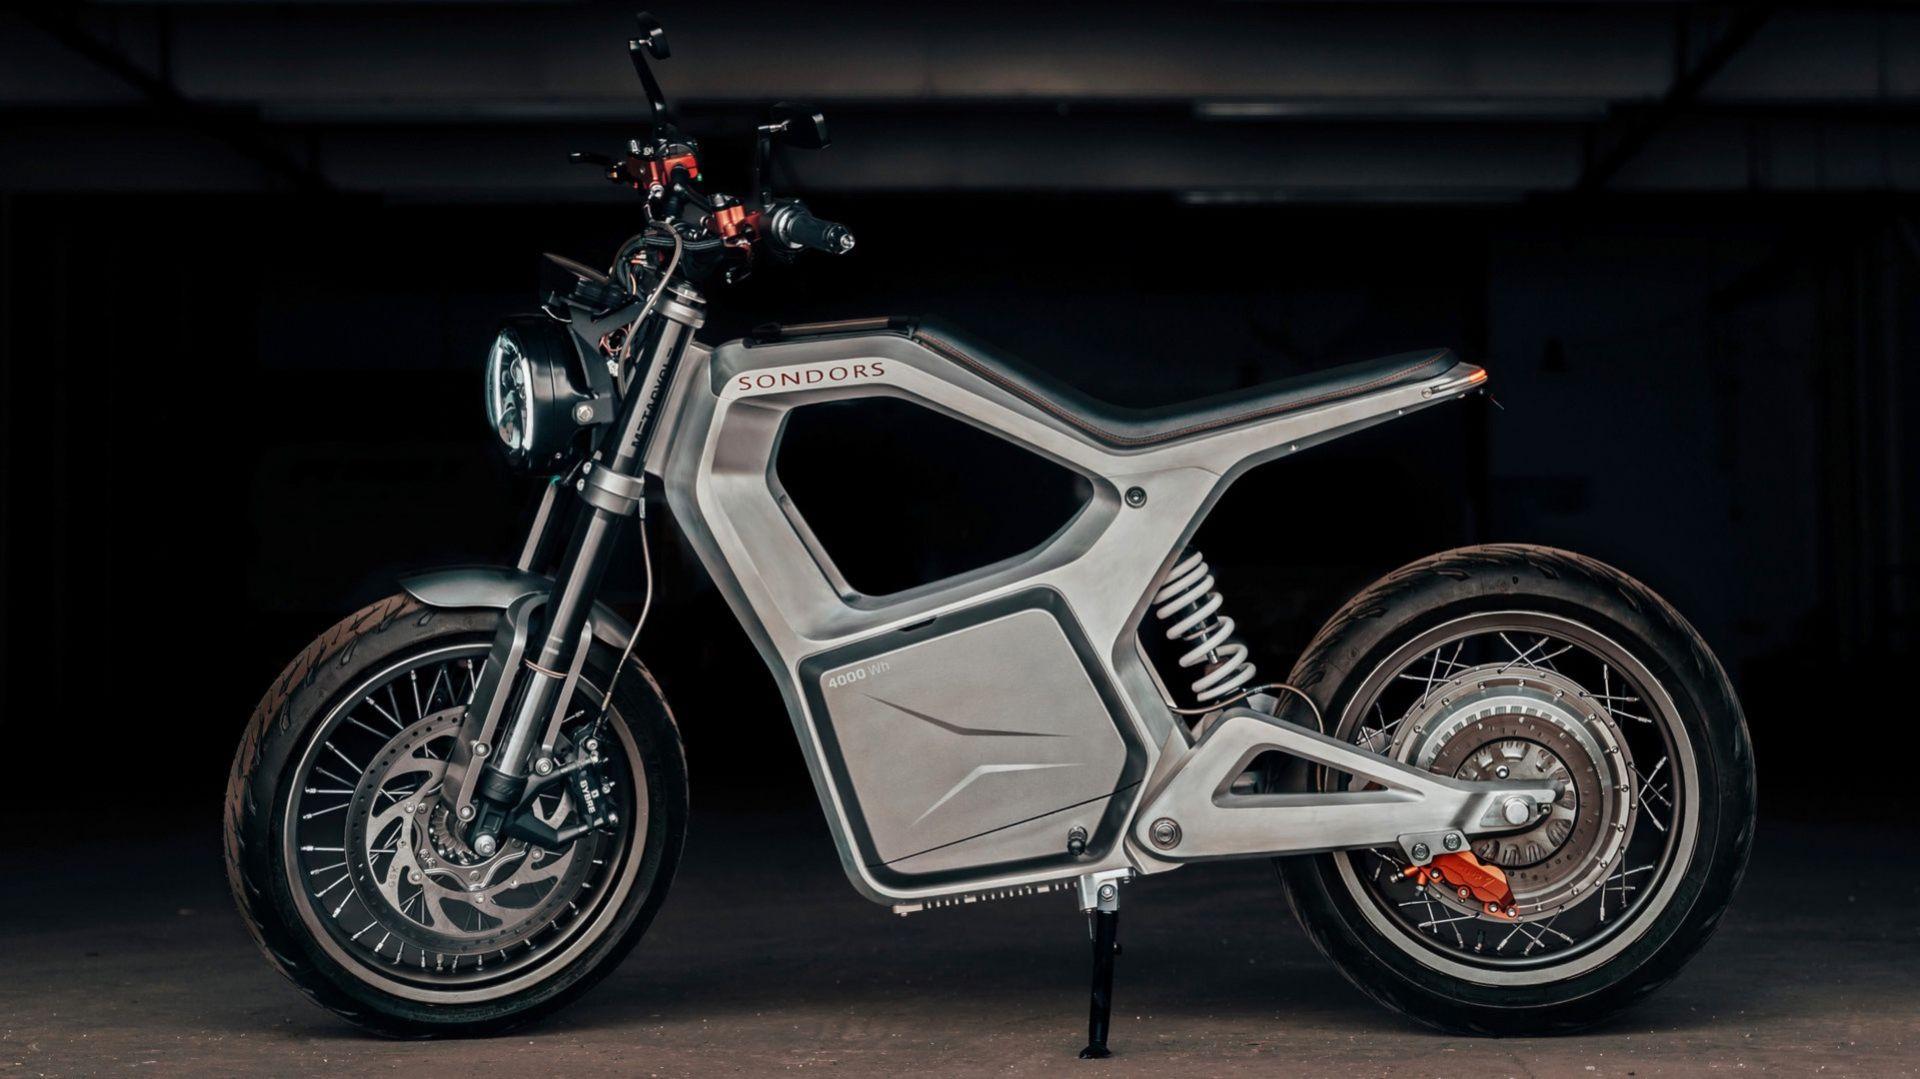 Sondors presenterar den eldrivna motorcykeln Metacycle